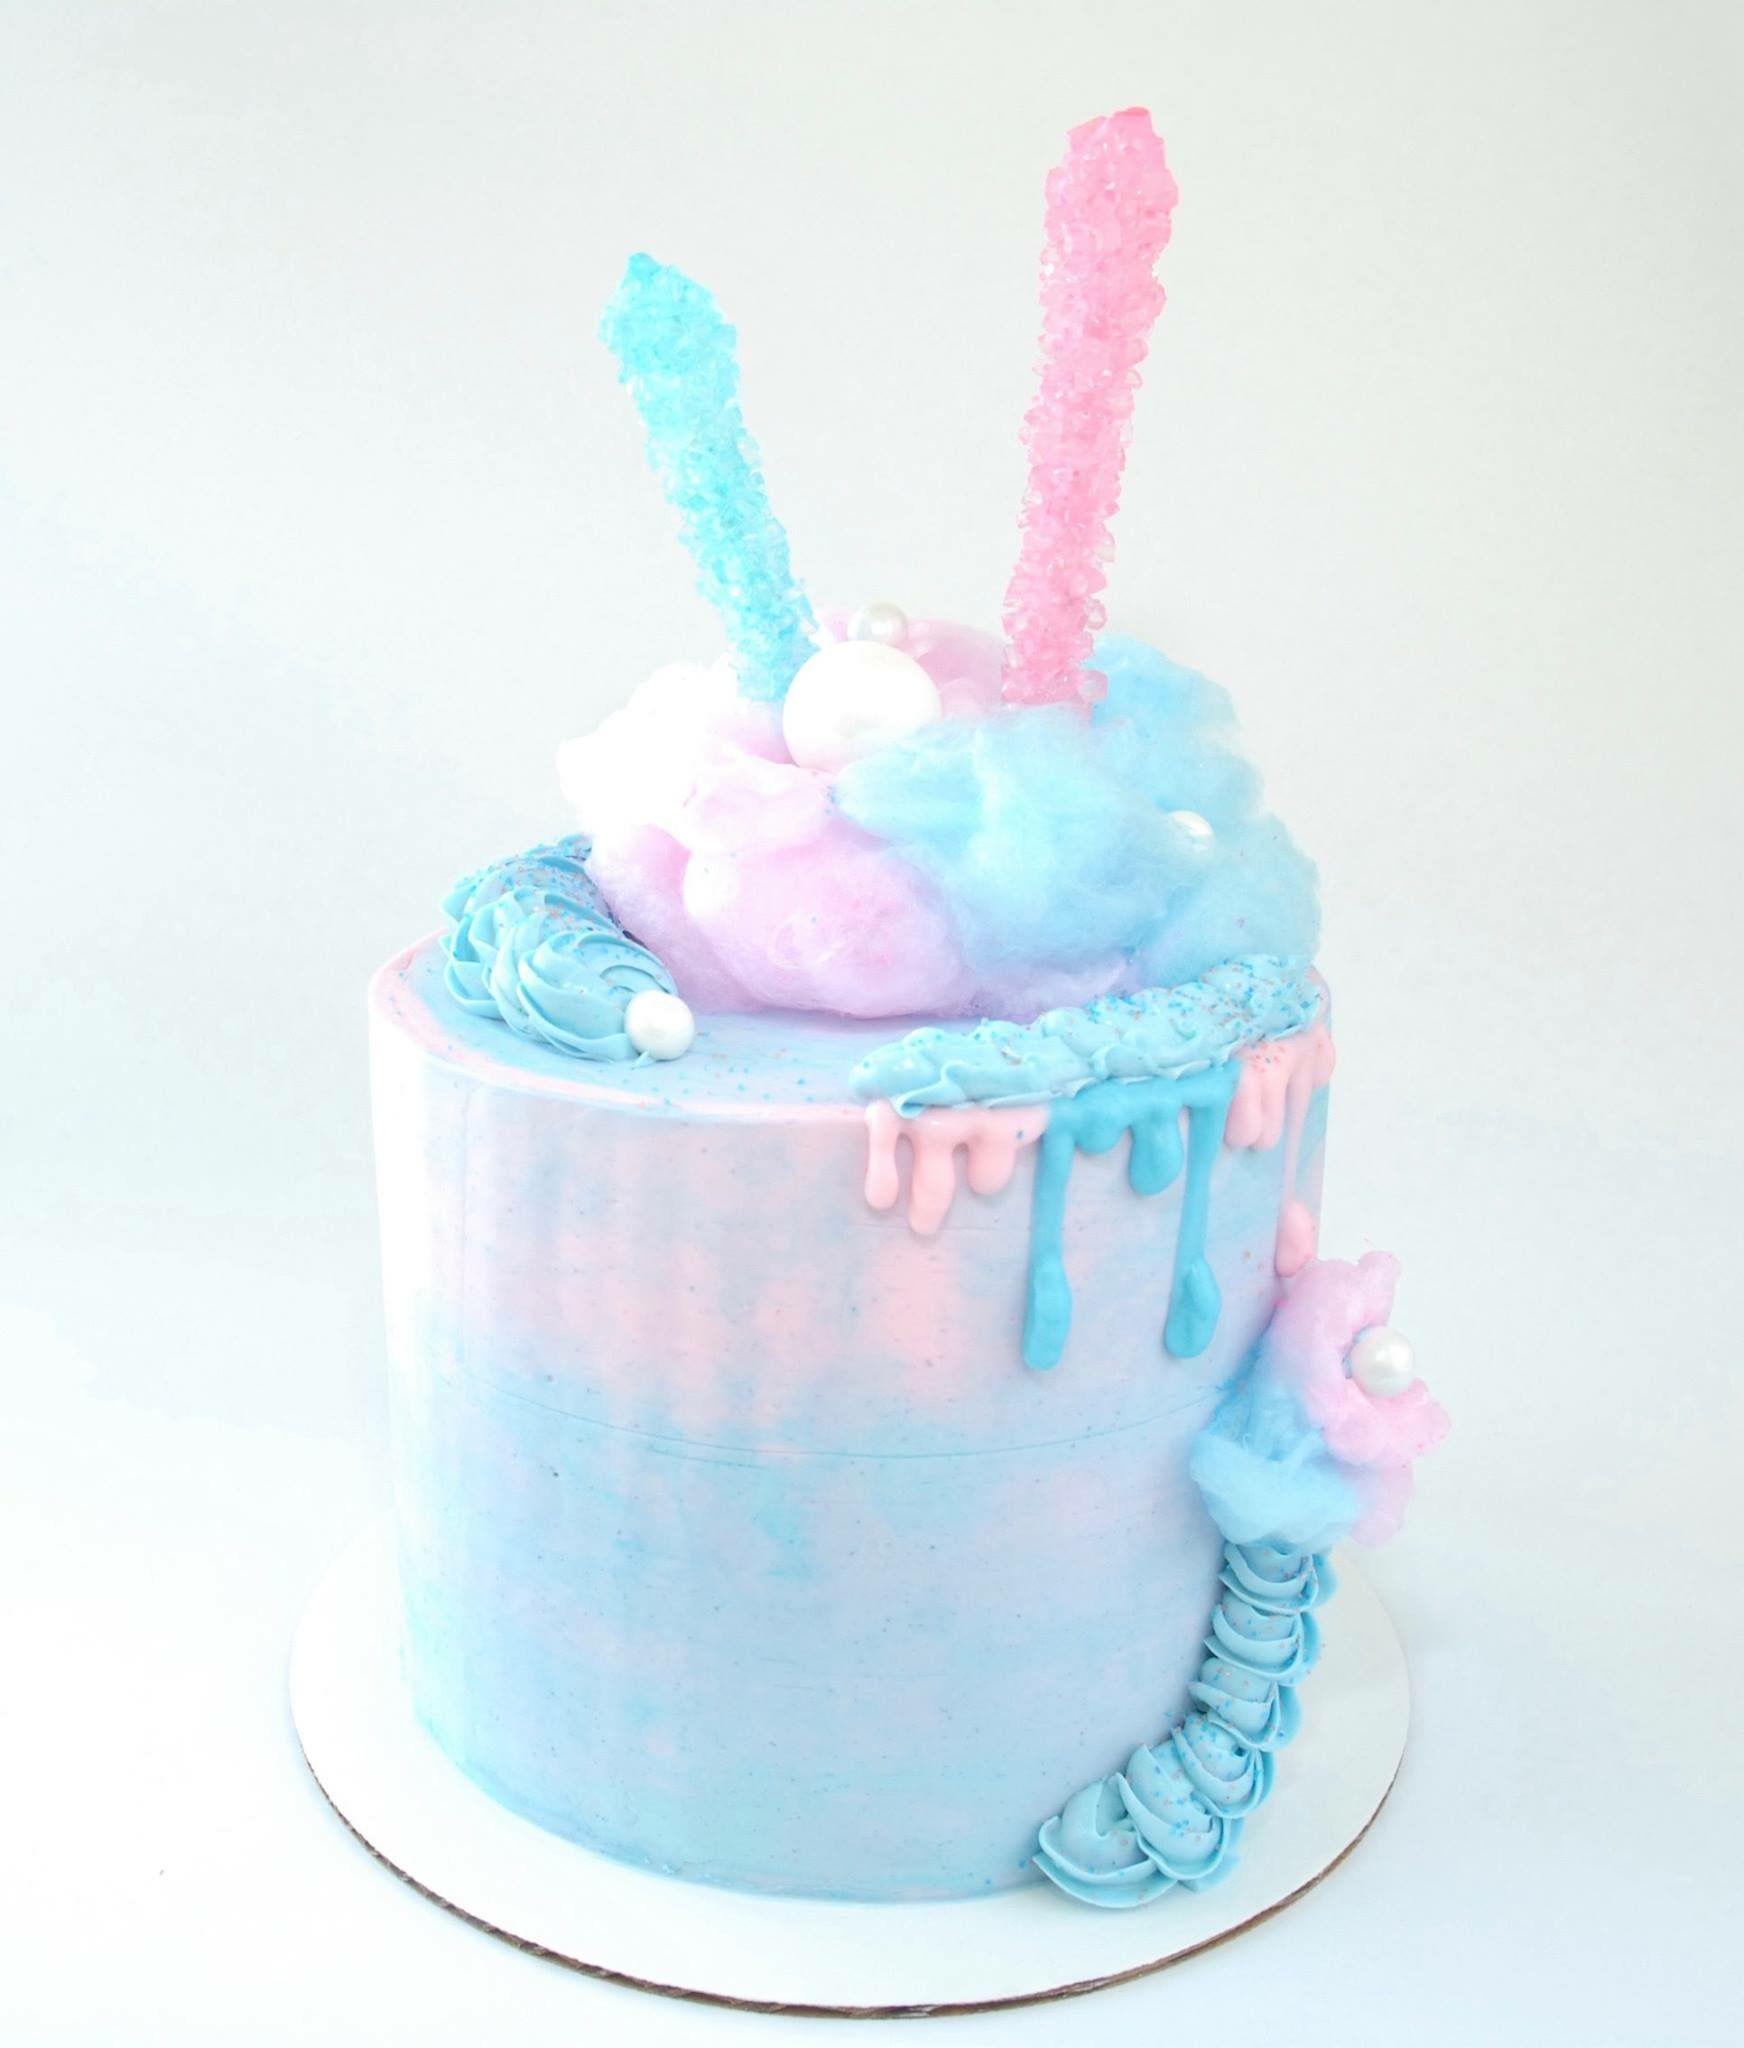 Magnificent Cotton Candy Cake Candy Birthday Cakes Candy Theme Cake Cotton Funny Birthday Cards Online Hendilapandamsfinfo